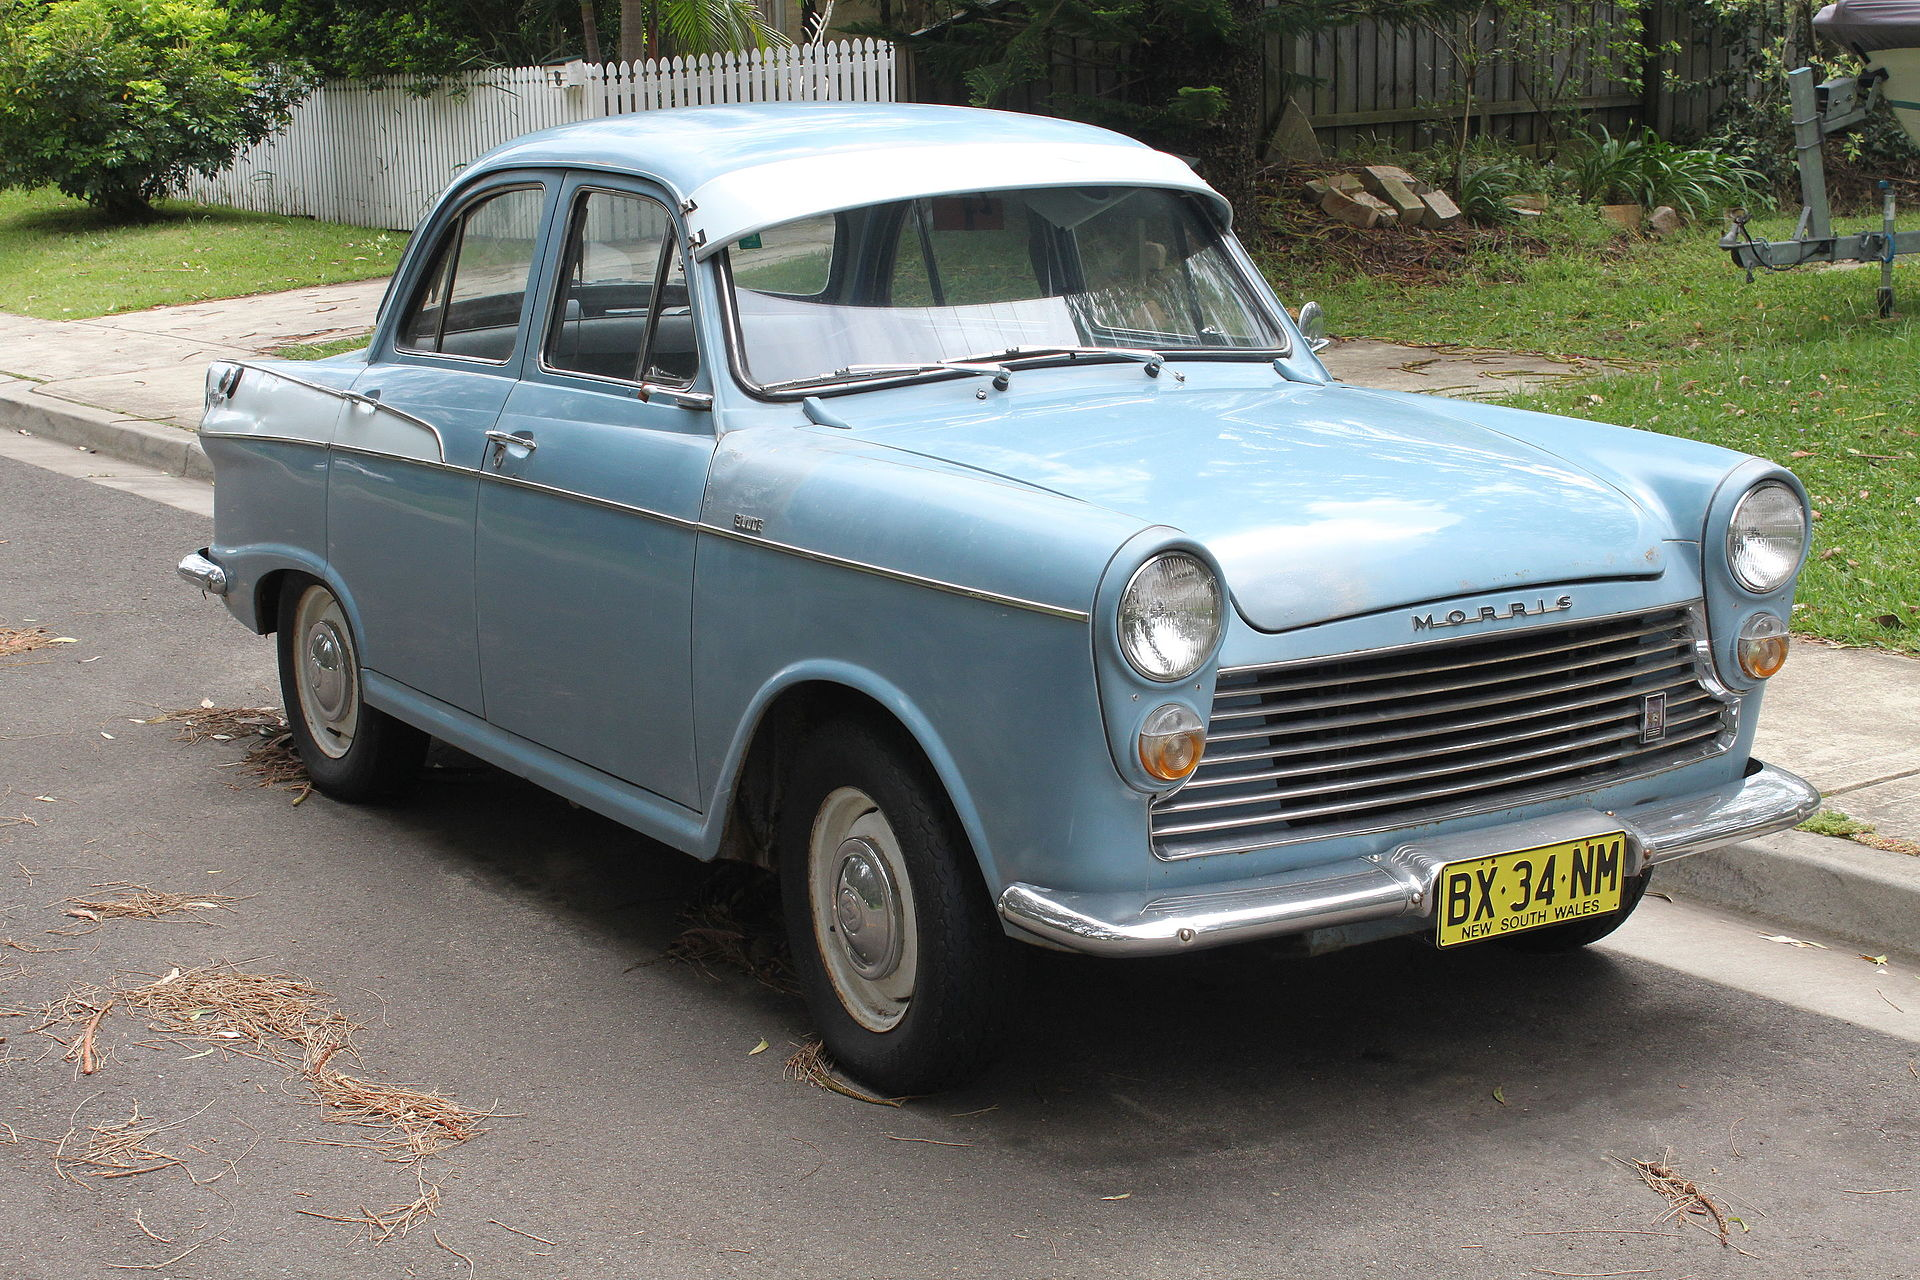 Elite Motor Cars: Morris Major